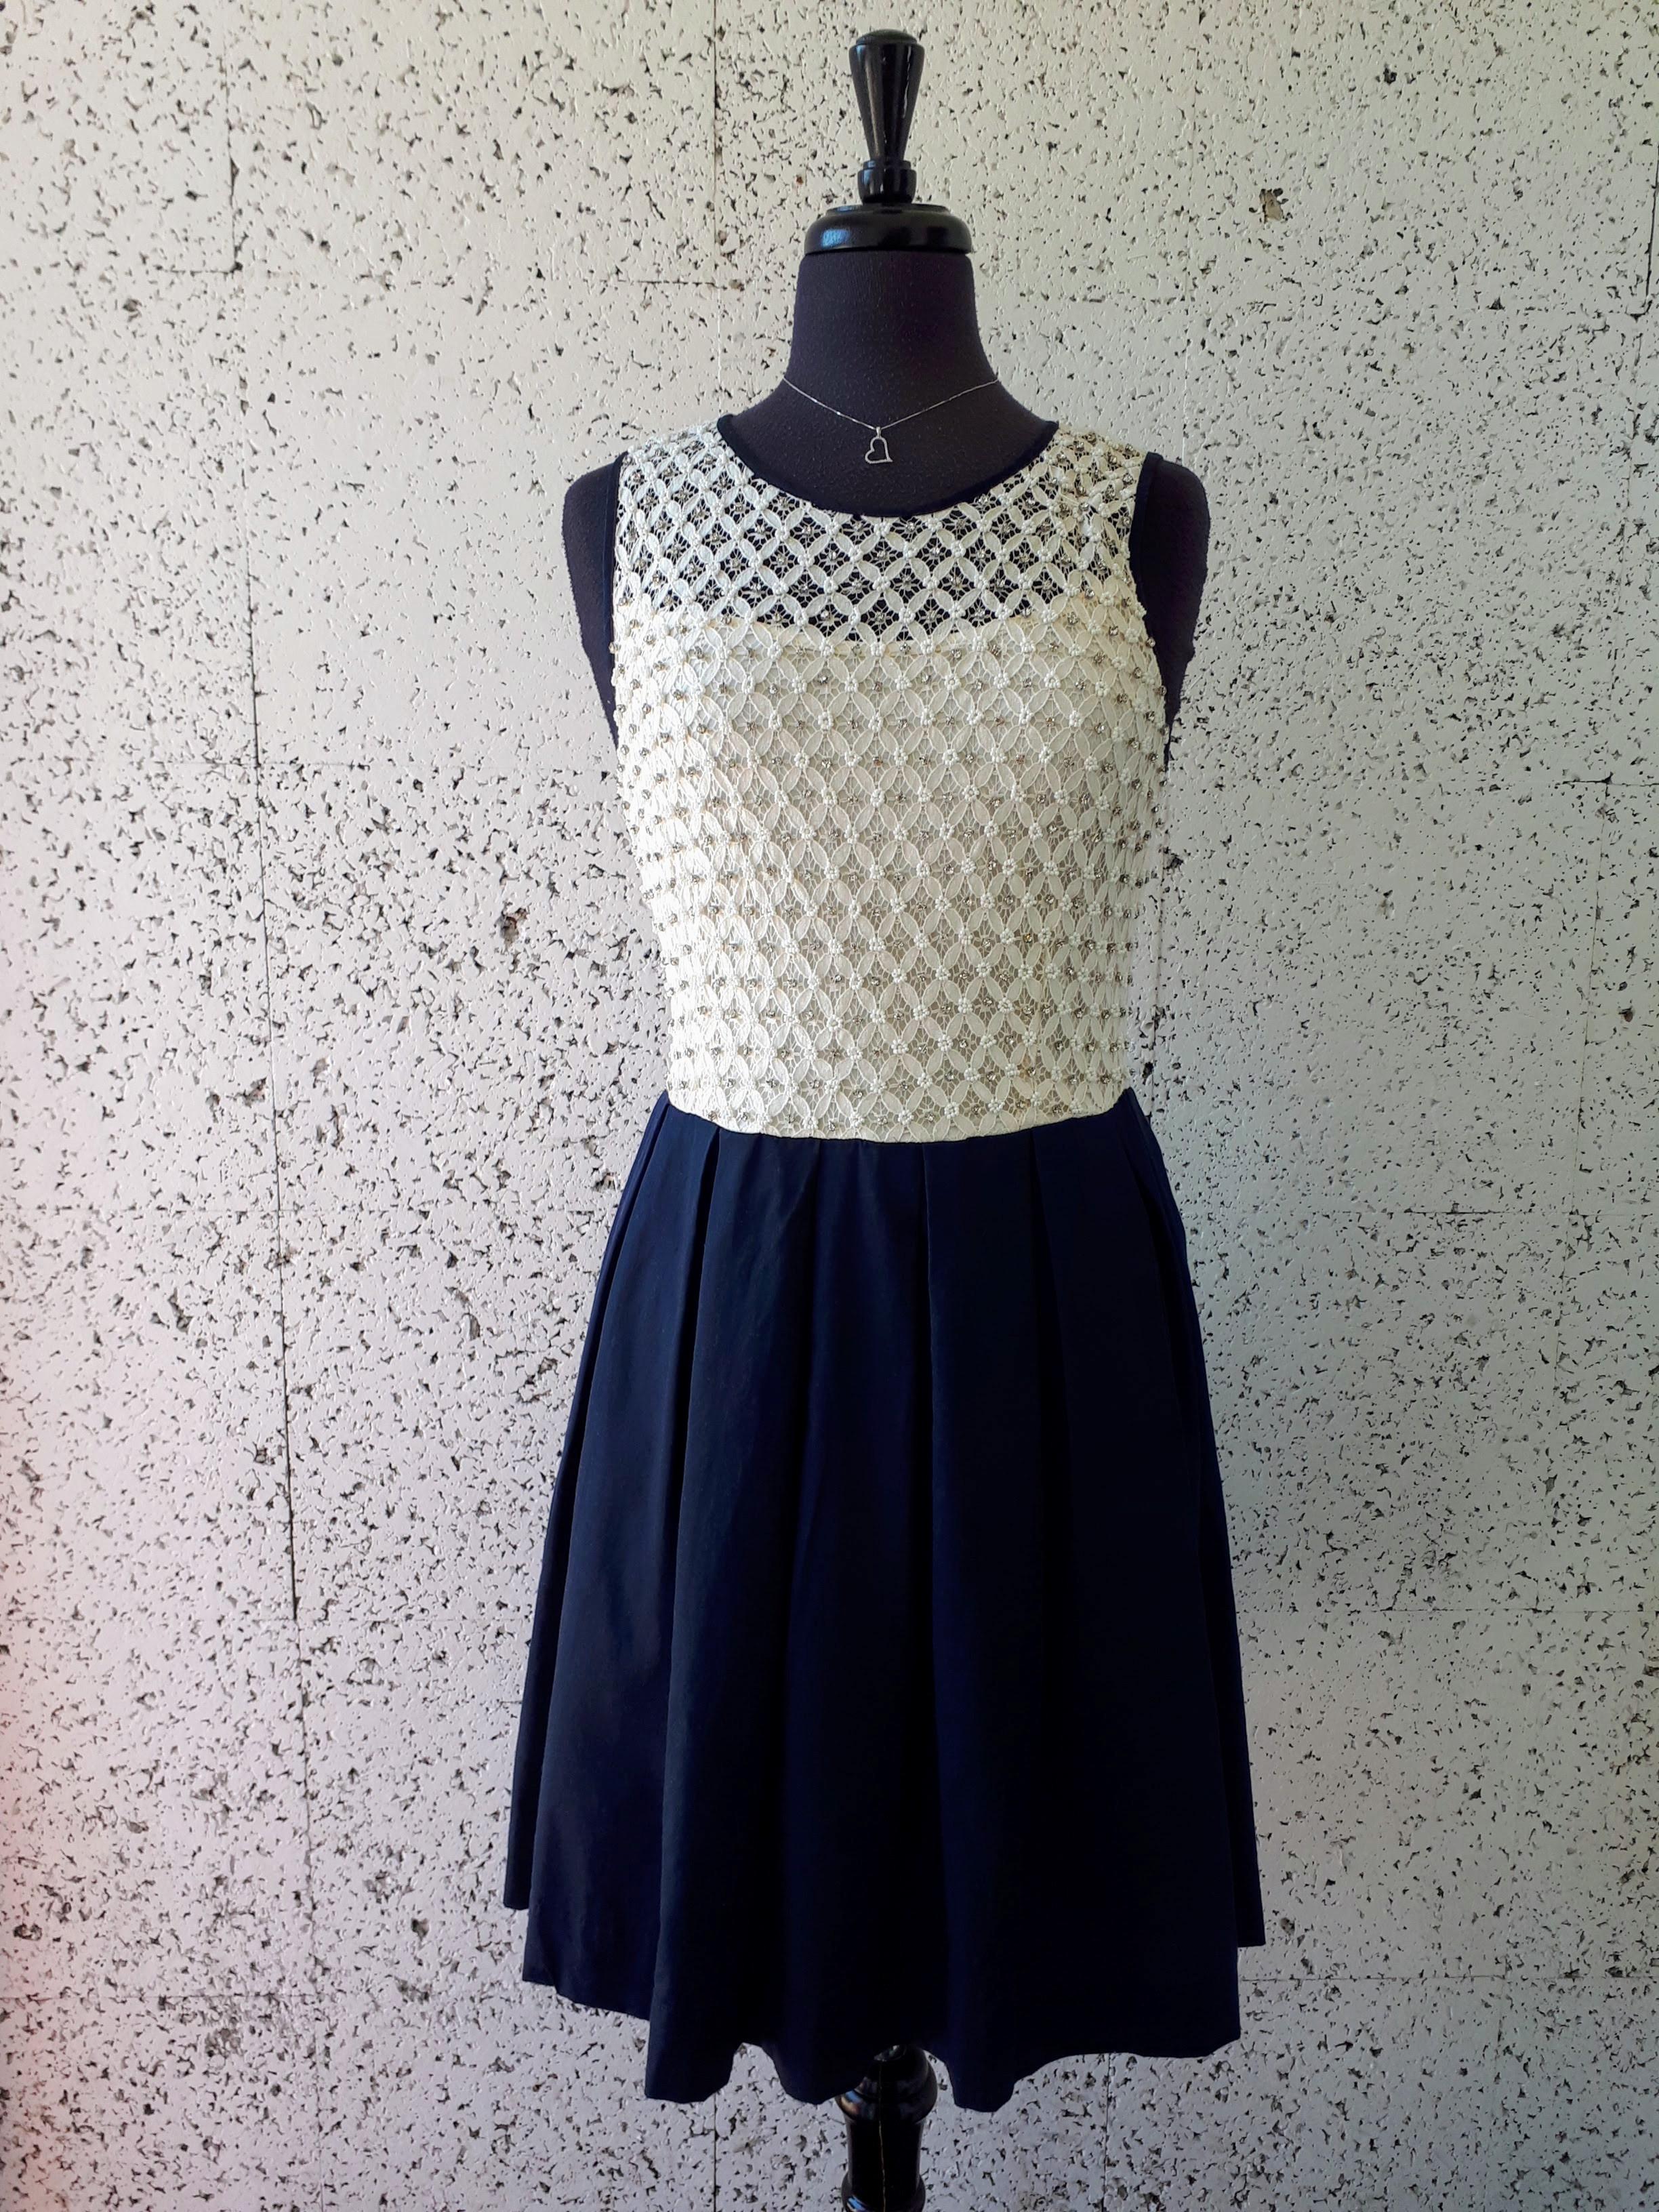 Beaded dress; Size M, $38